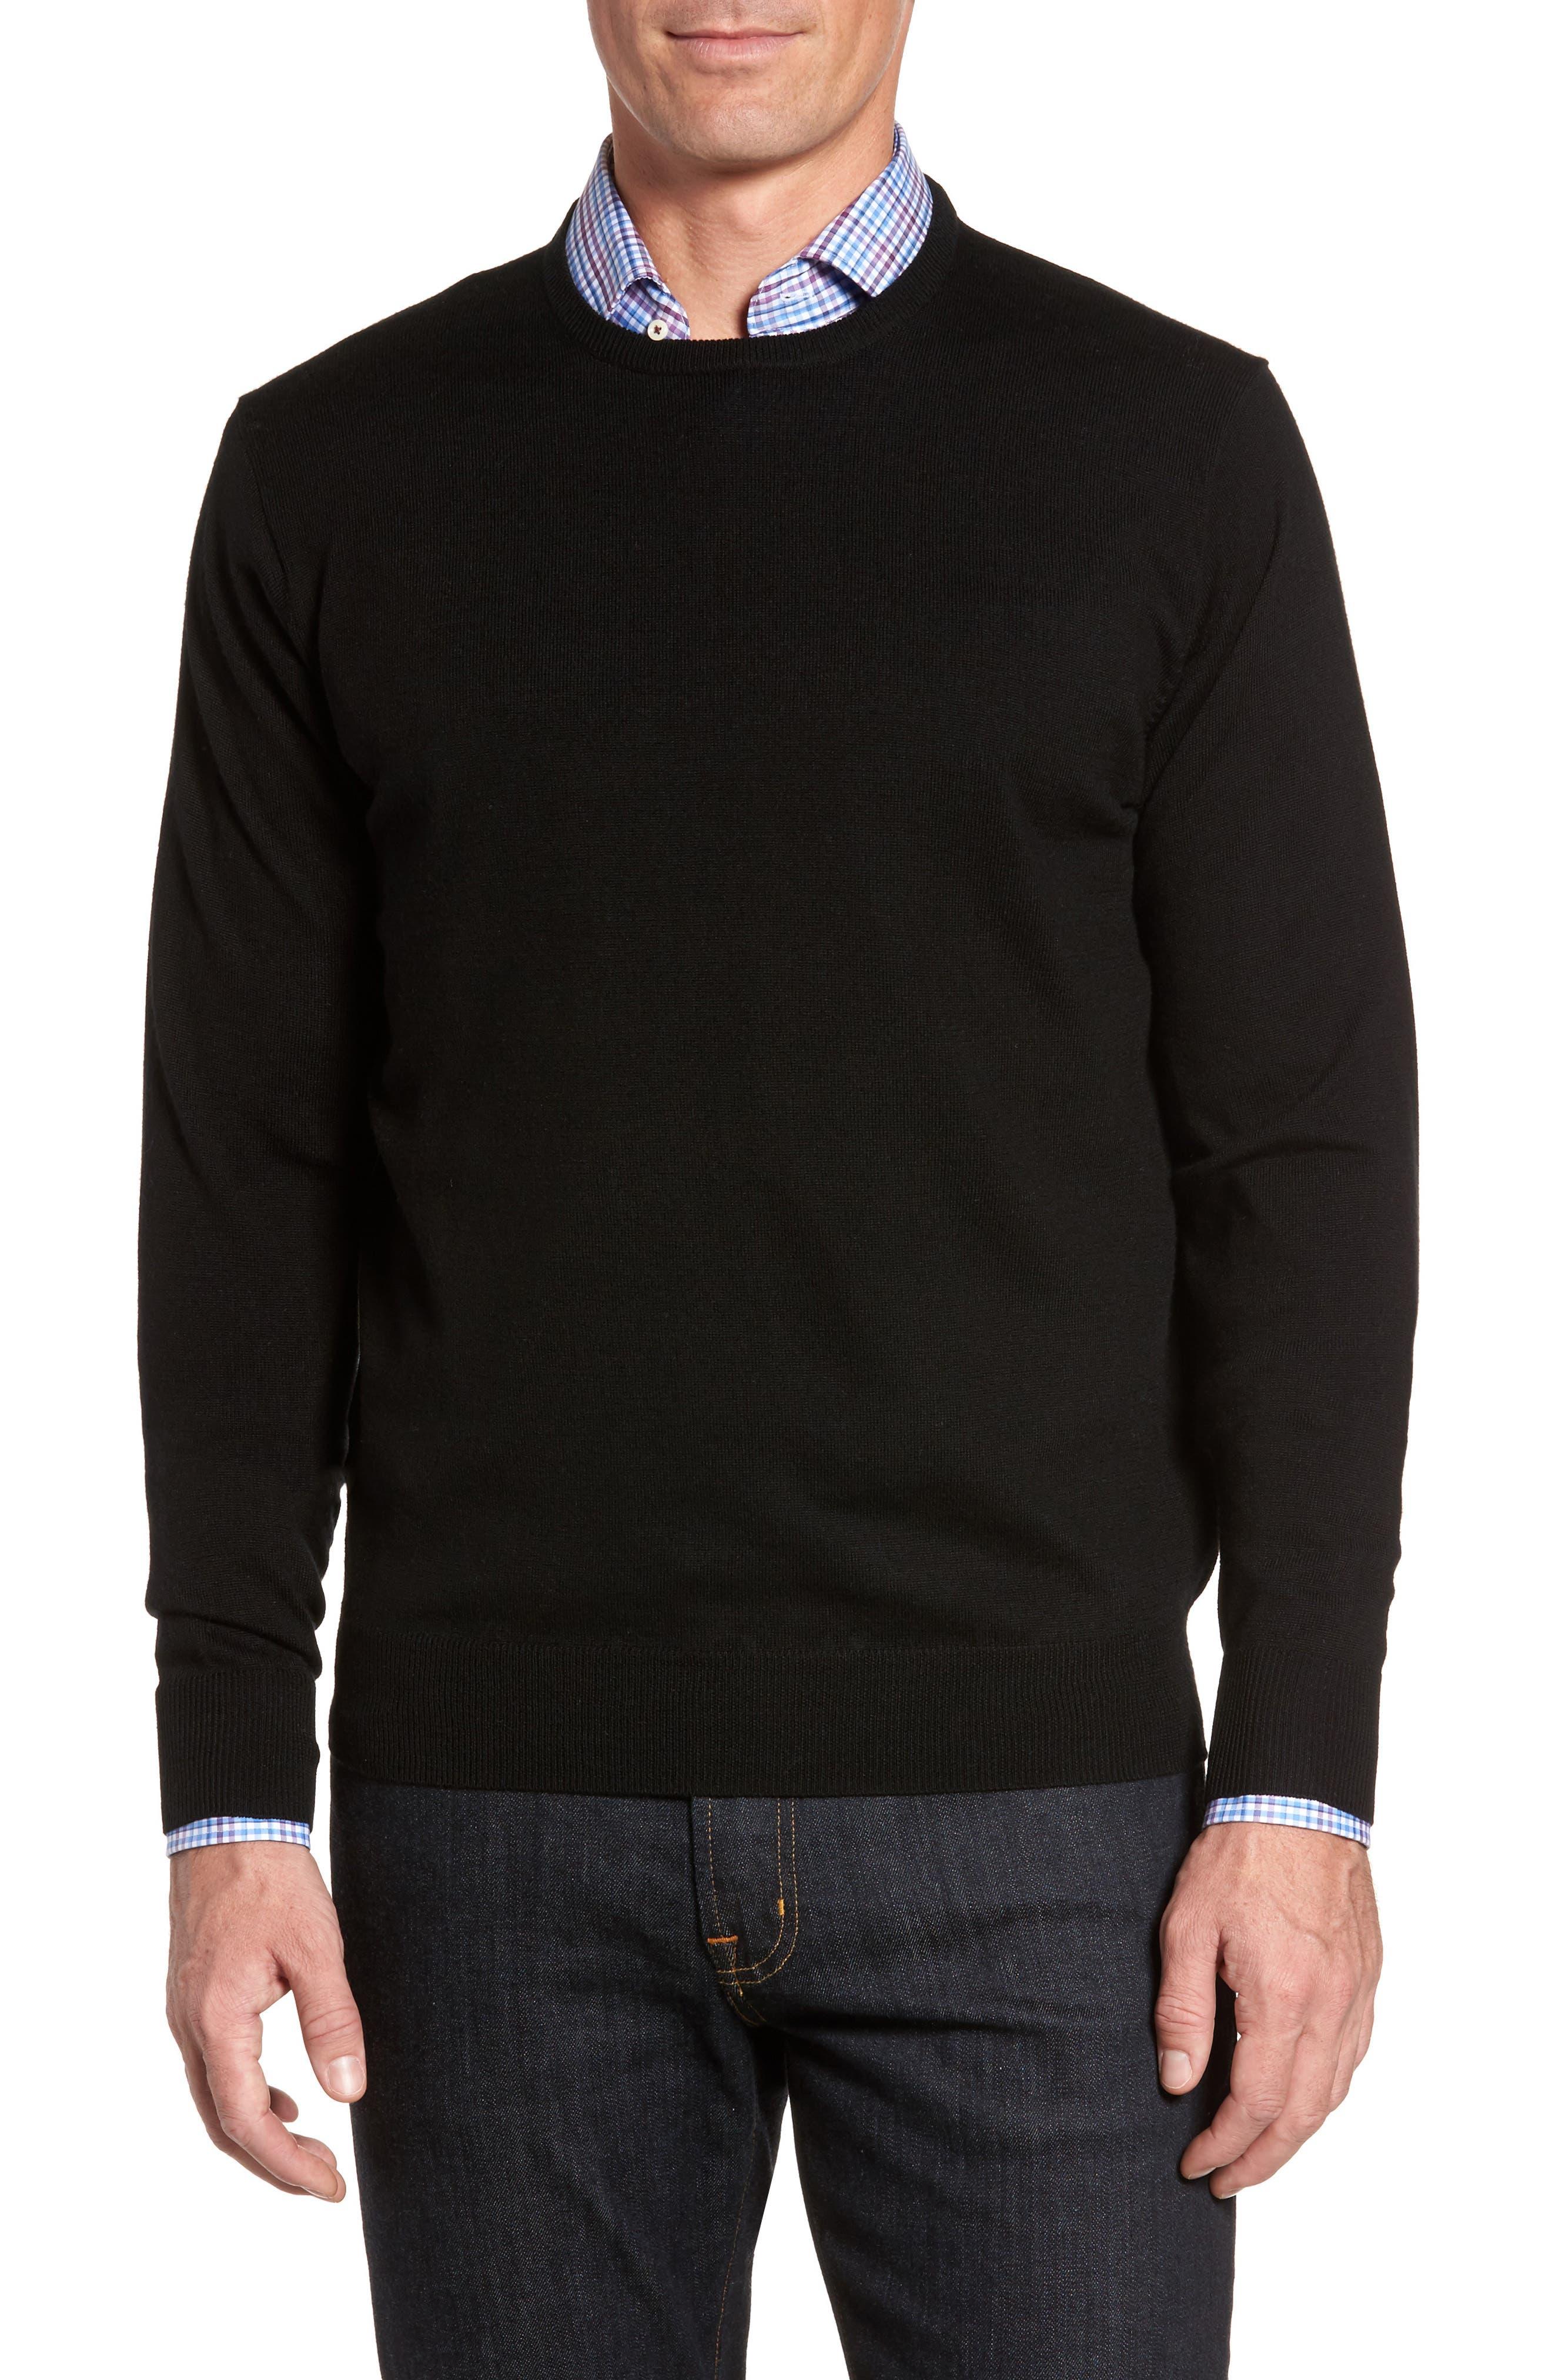 Alternate Image 1 Selected - Peter Millar Crown Soft Merino Wool & Silk Crewneck Sweater